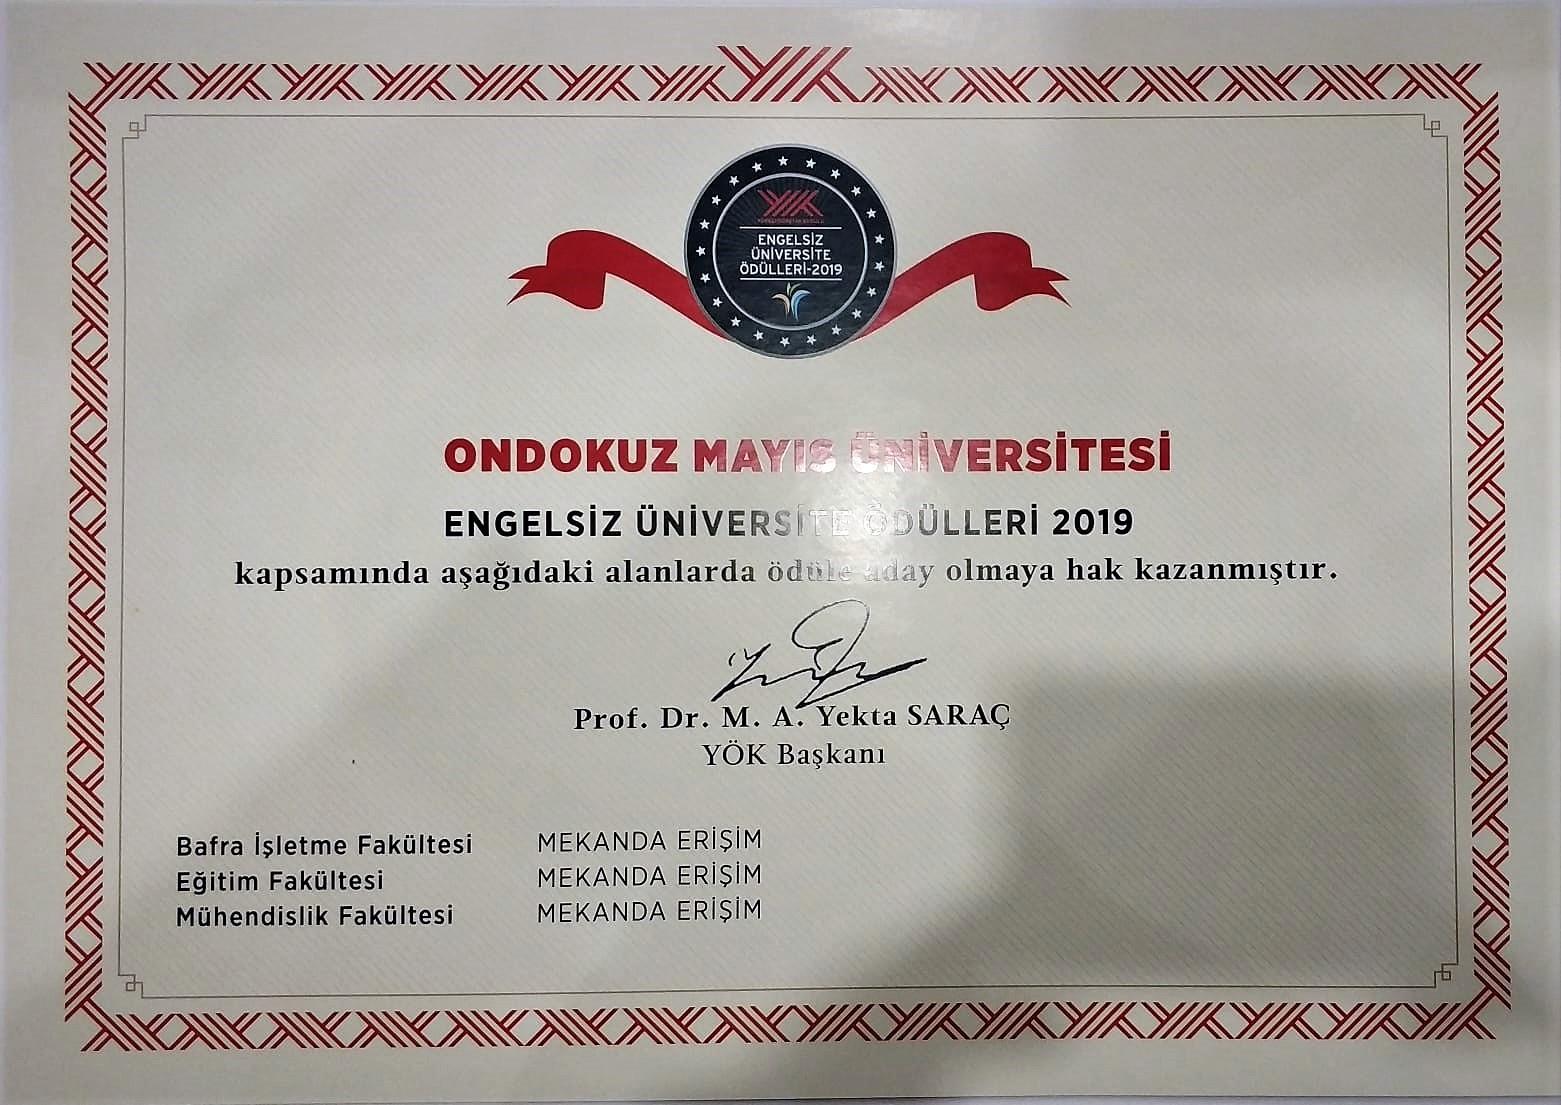 http://www.omu.edu.tr/sites/default/files/files/omuye_engelsiz_universite_odulu/omu_odul_mekan_erisim_aday_2019-05-15_at_16.30.09.jpeg